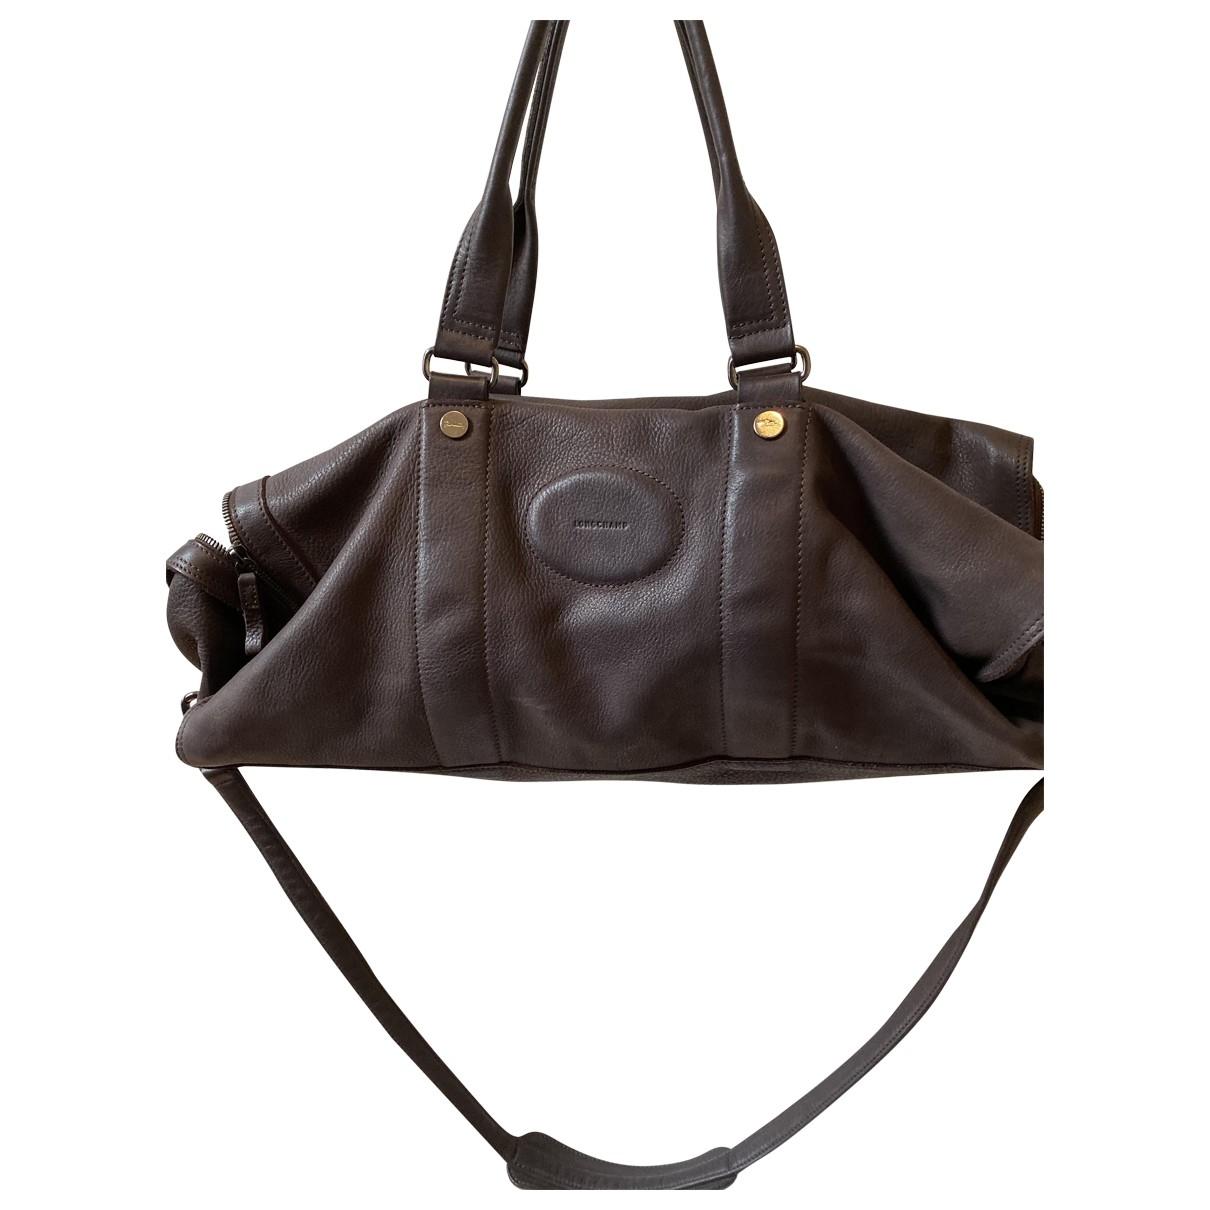 Longchamp \N Reisen in  Braun Kunststoff